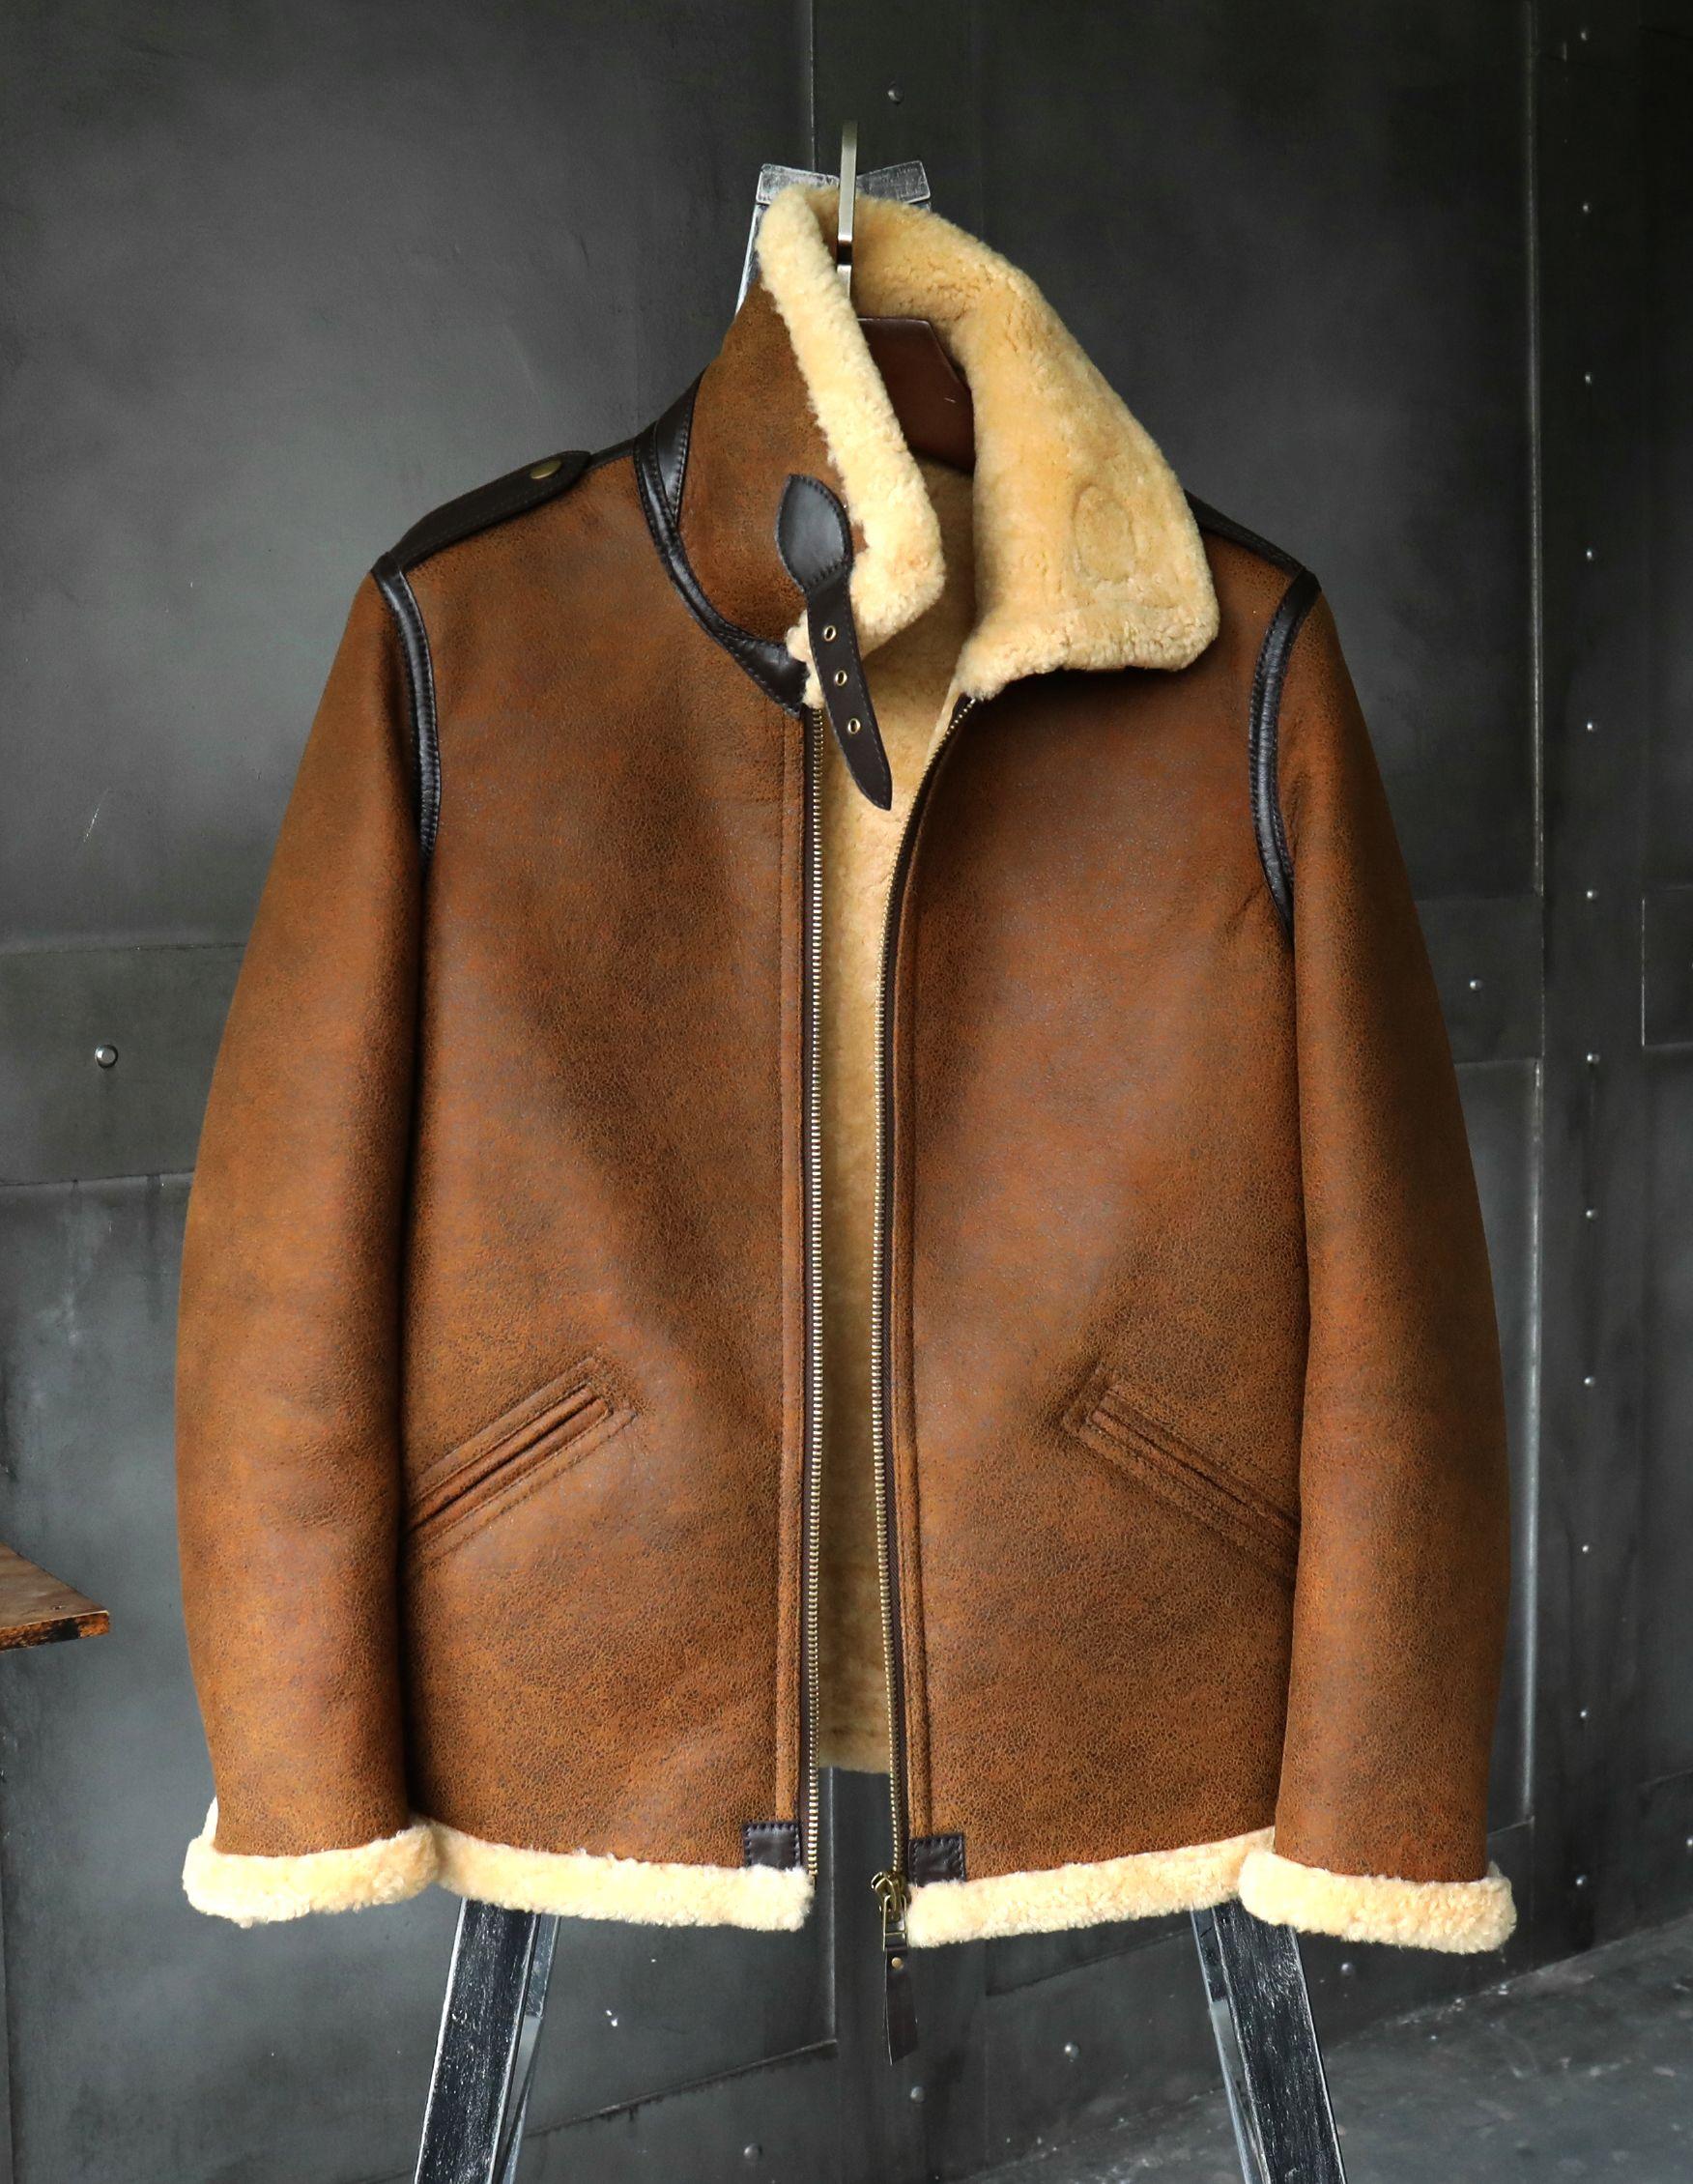 56a7c777b56 Denny Dora Mens Sheepskin Shearling Jacket B3 Flight Jacket Imported Wool  from Australia Short Leather Jacket Mans Fur Coat